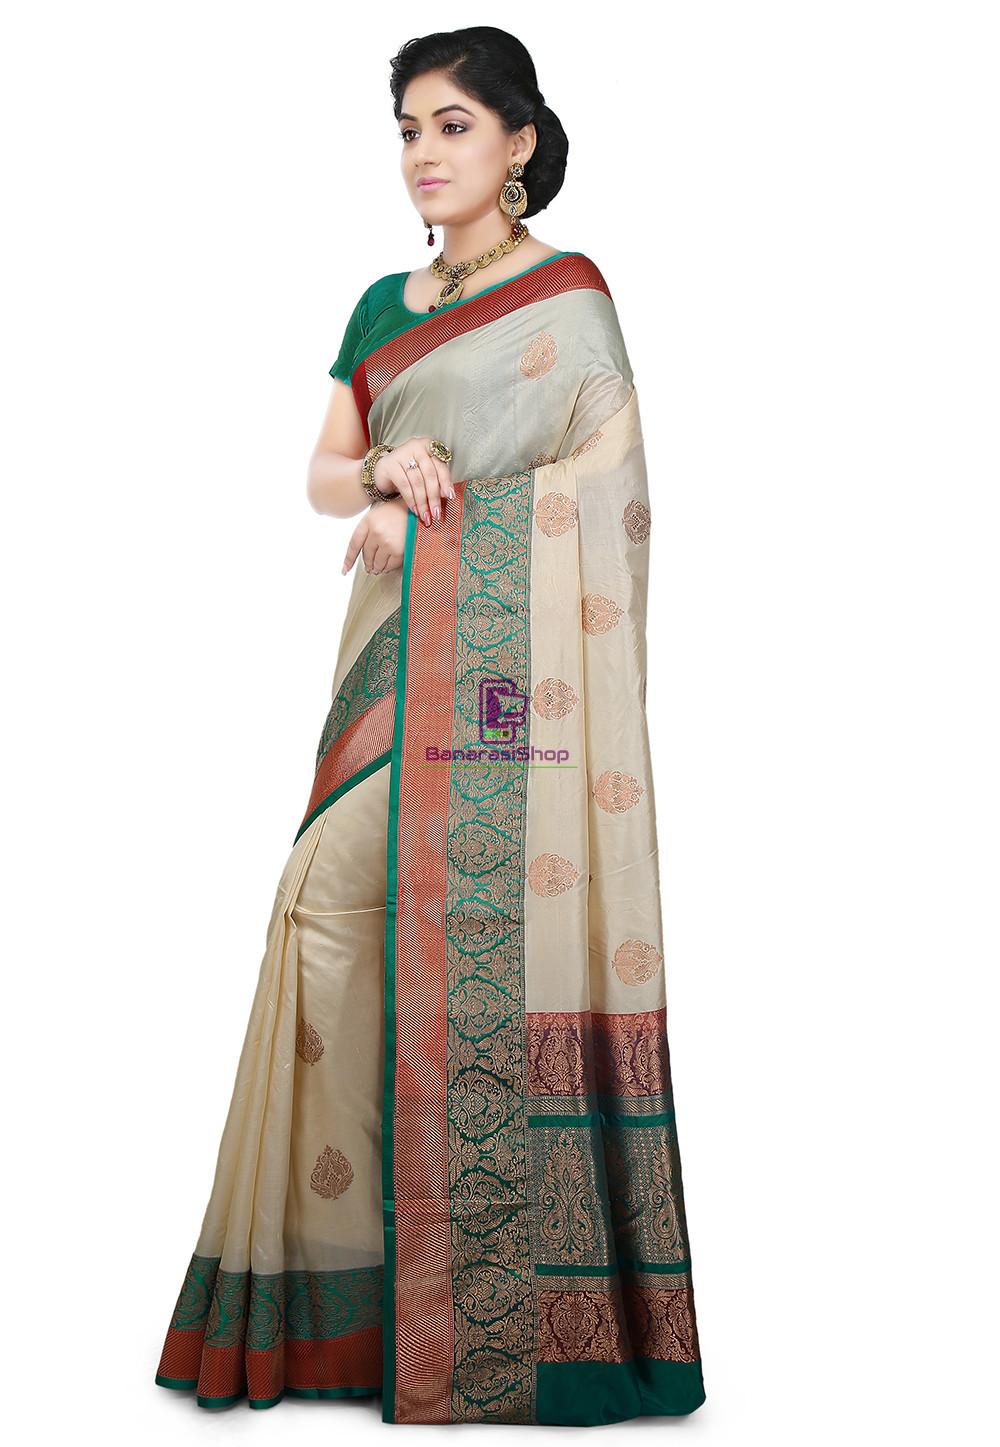 Banarasi Pure Katan Silk Handloom Saree in Light Beige 4